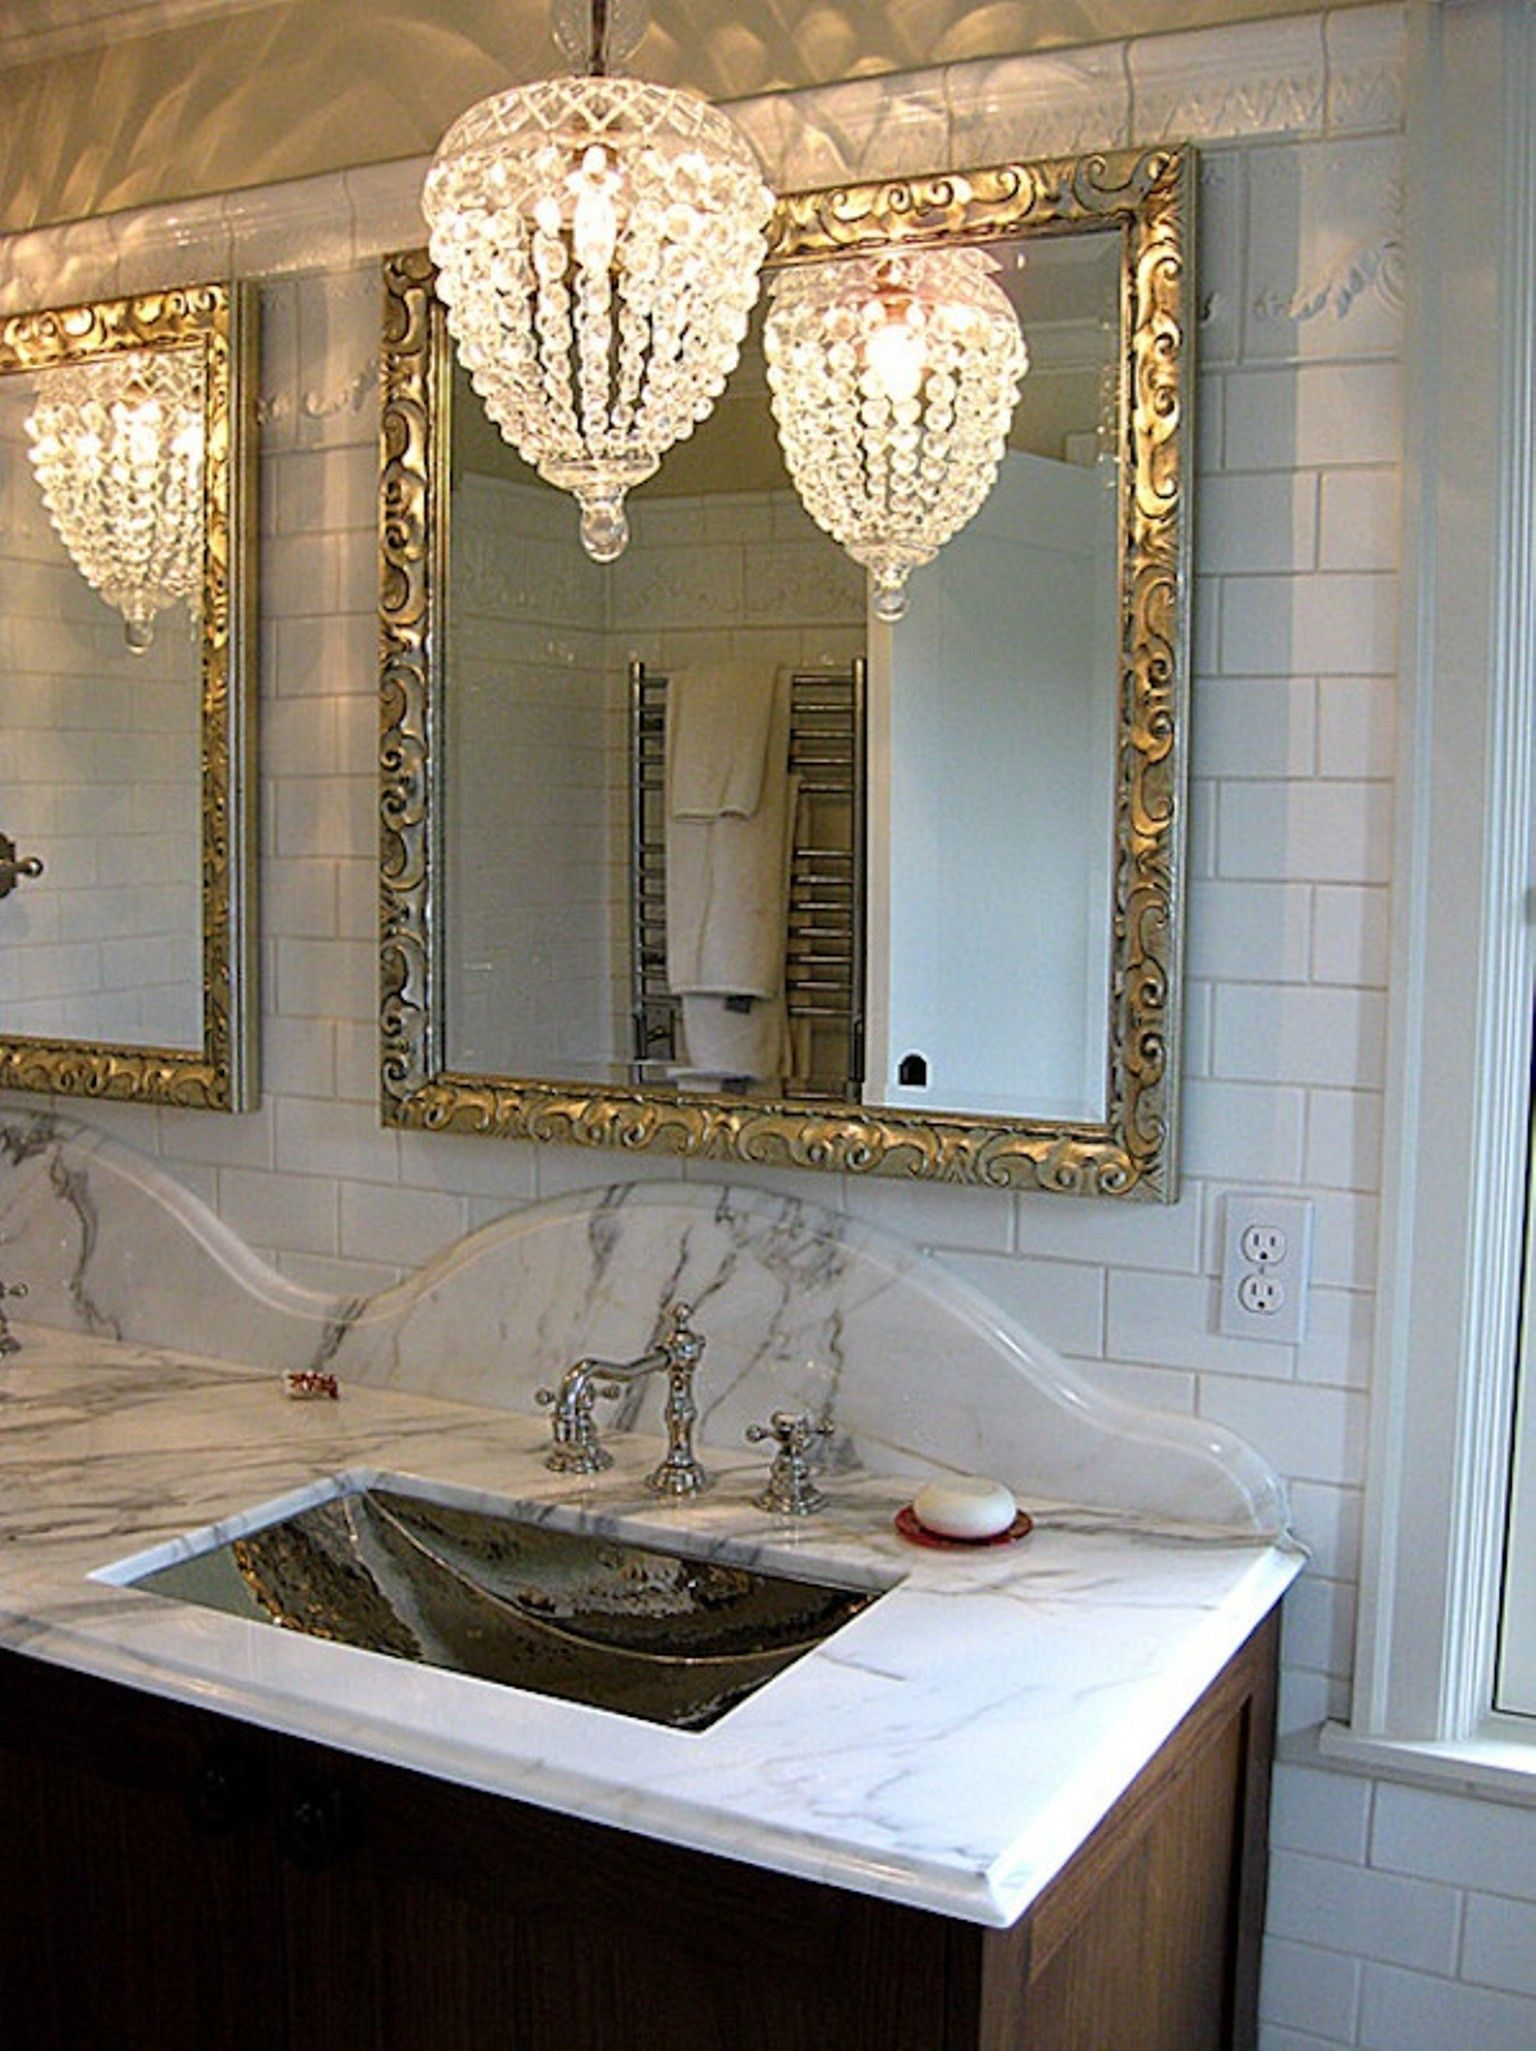 Awesome Small Bathroom Chandelier Crystal Design Bathroom Chandelier Bathroom Chandelier Lighting Bathroom Pendant Lighting